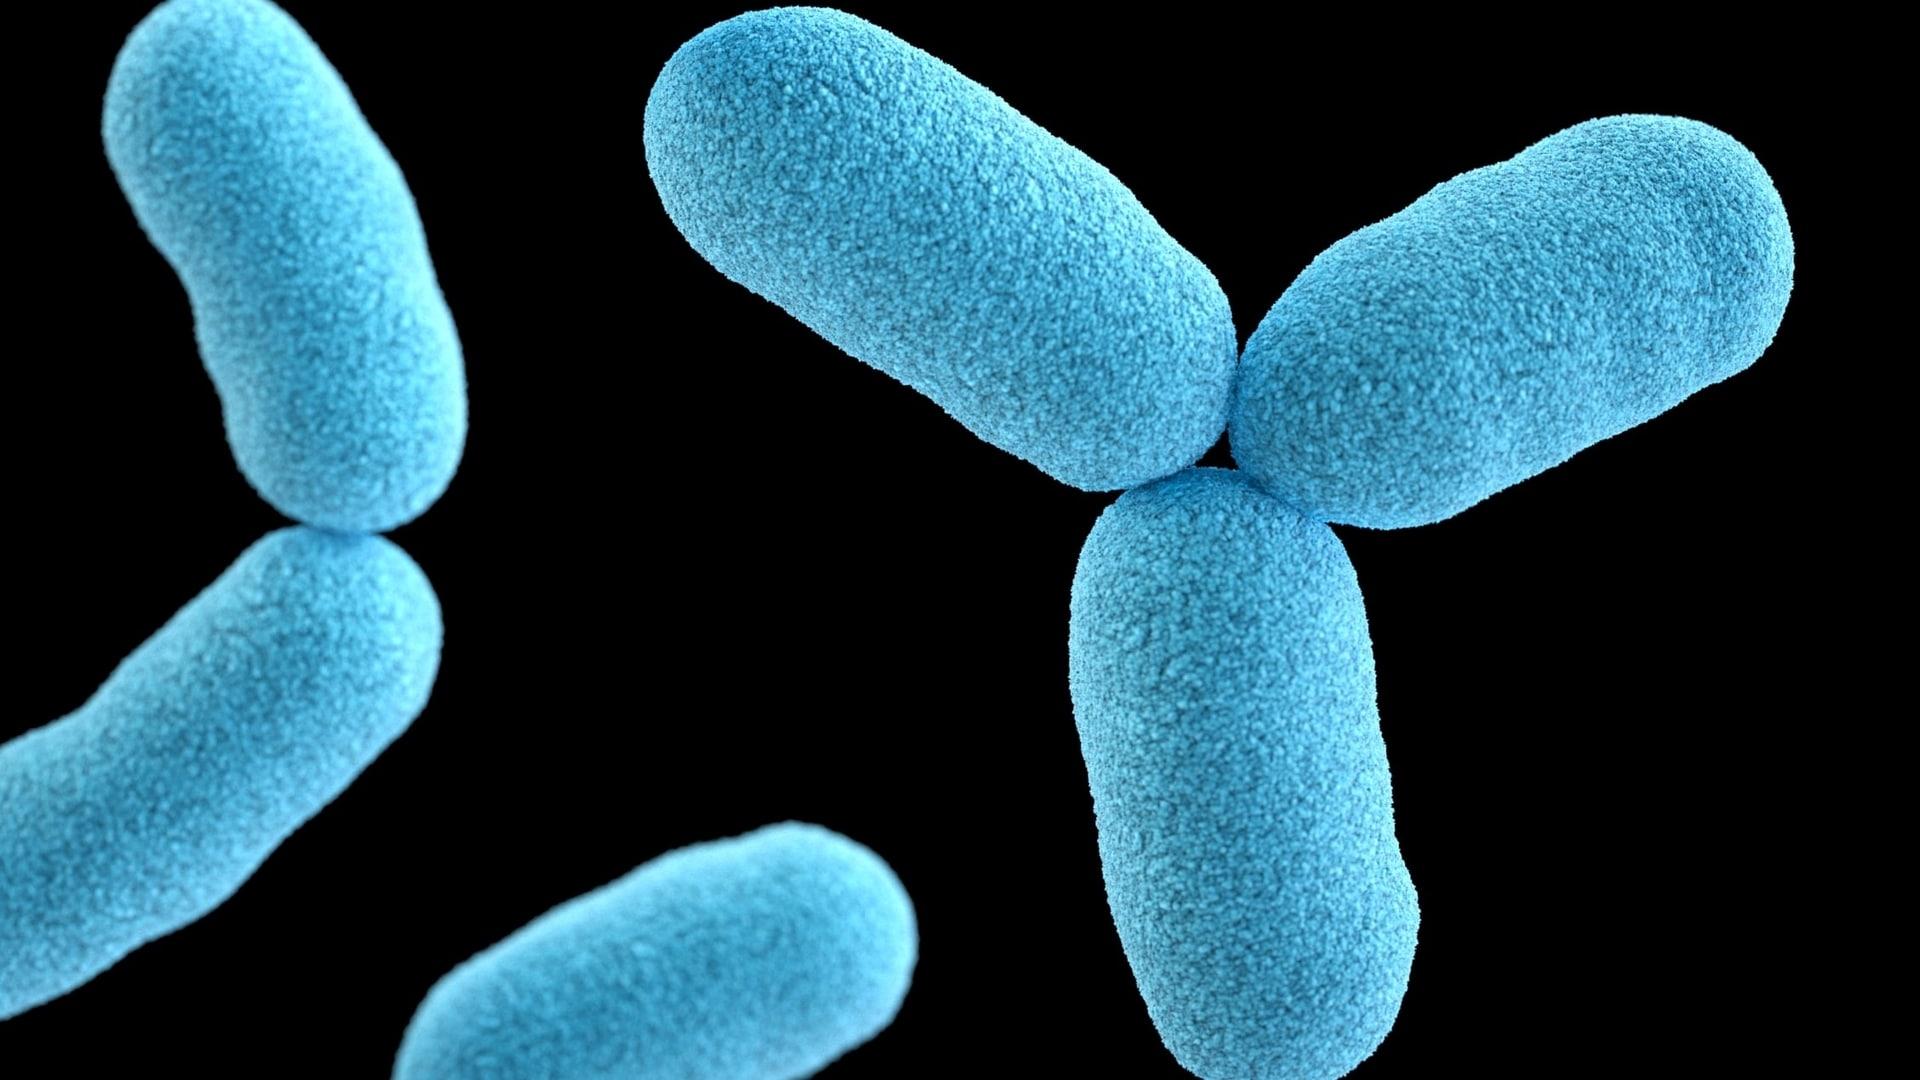 Zahnaerzte in der Filzfabrik Prophylaxe Bakterien